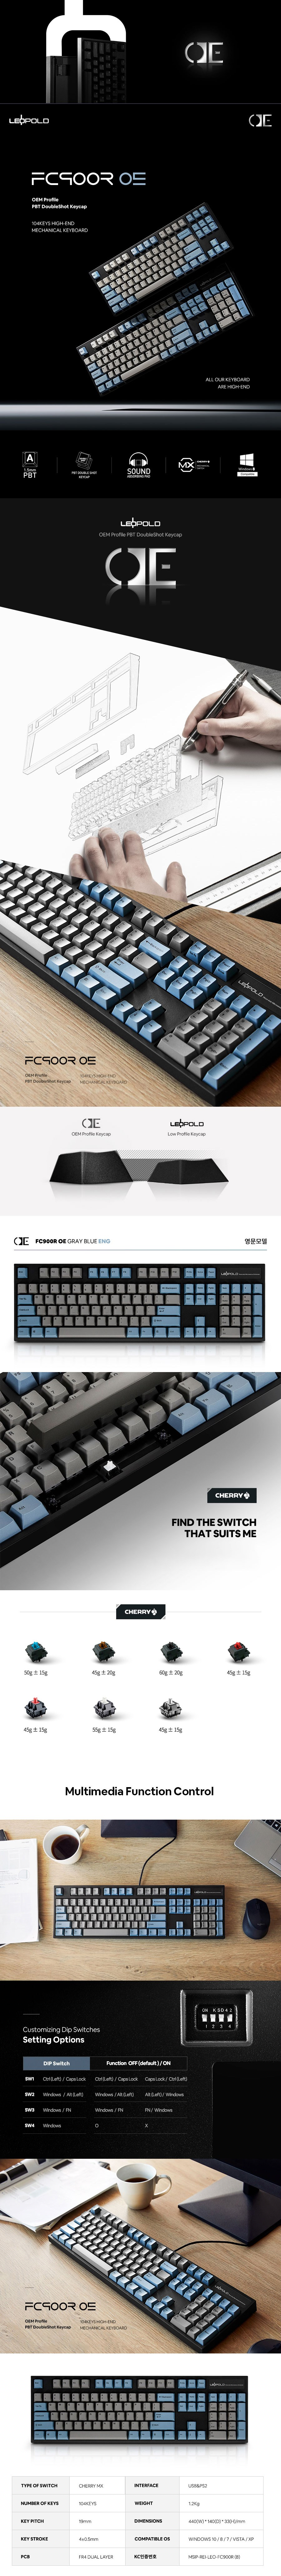 Leopold FC900R OE Blue/Grey Two-Tone Mechanical Keyboard - Overview 1